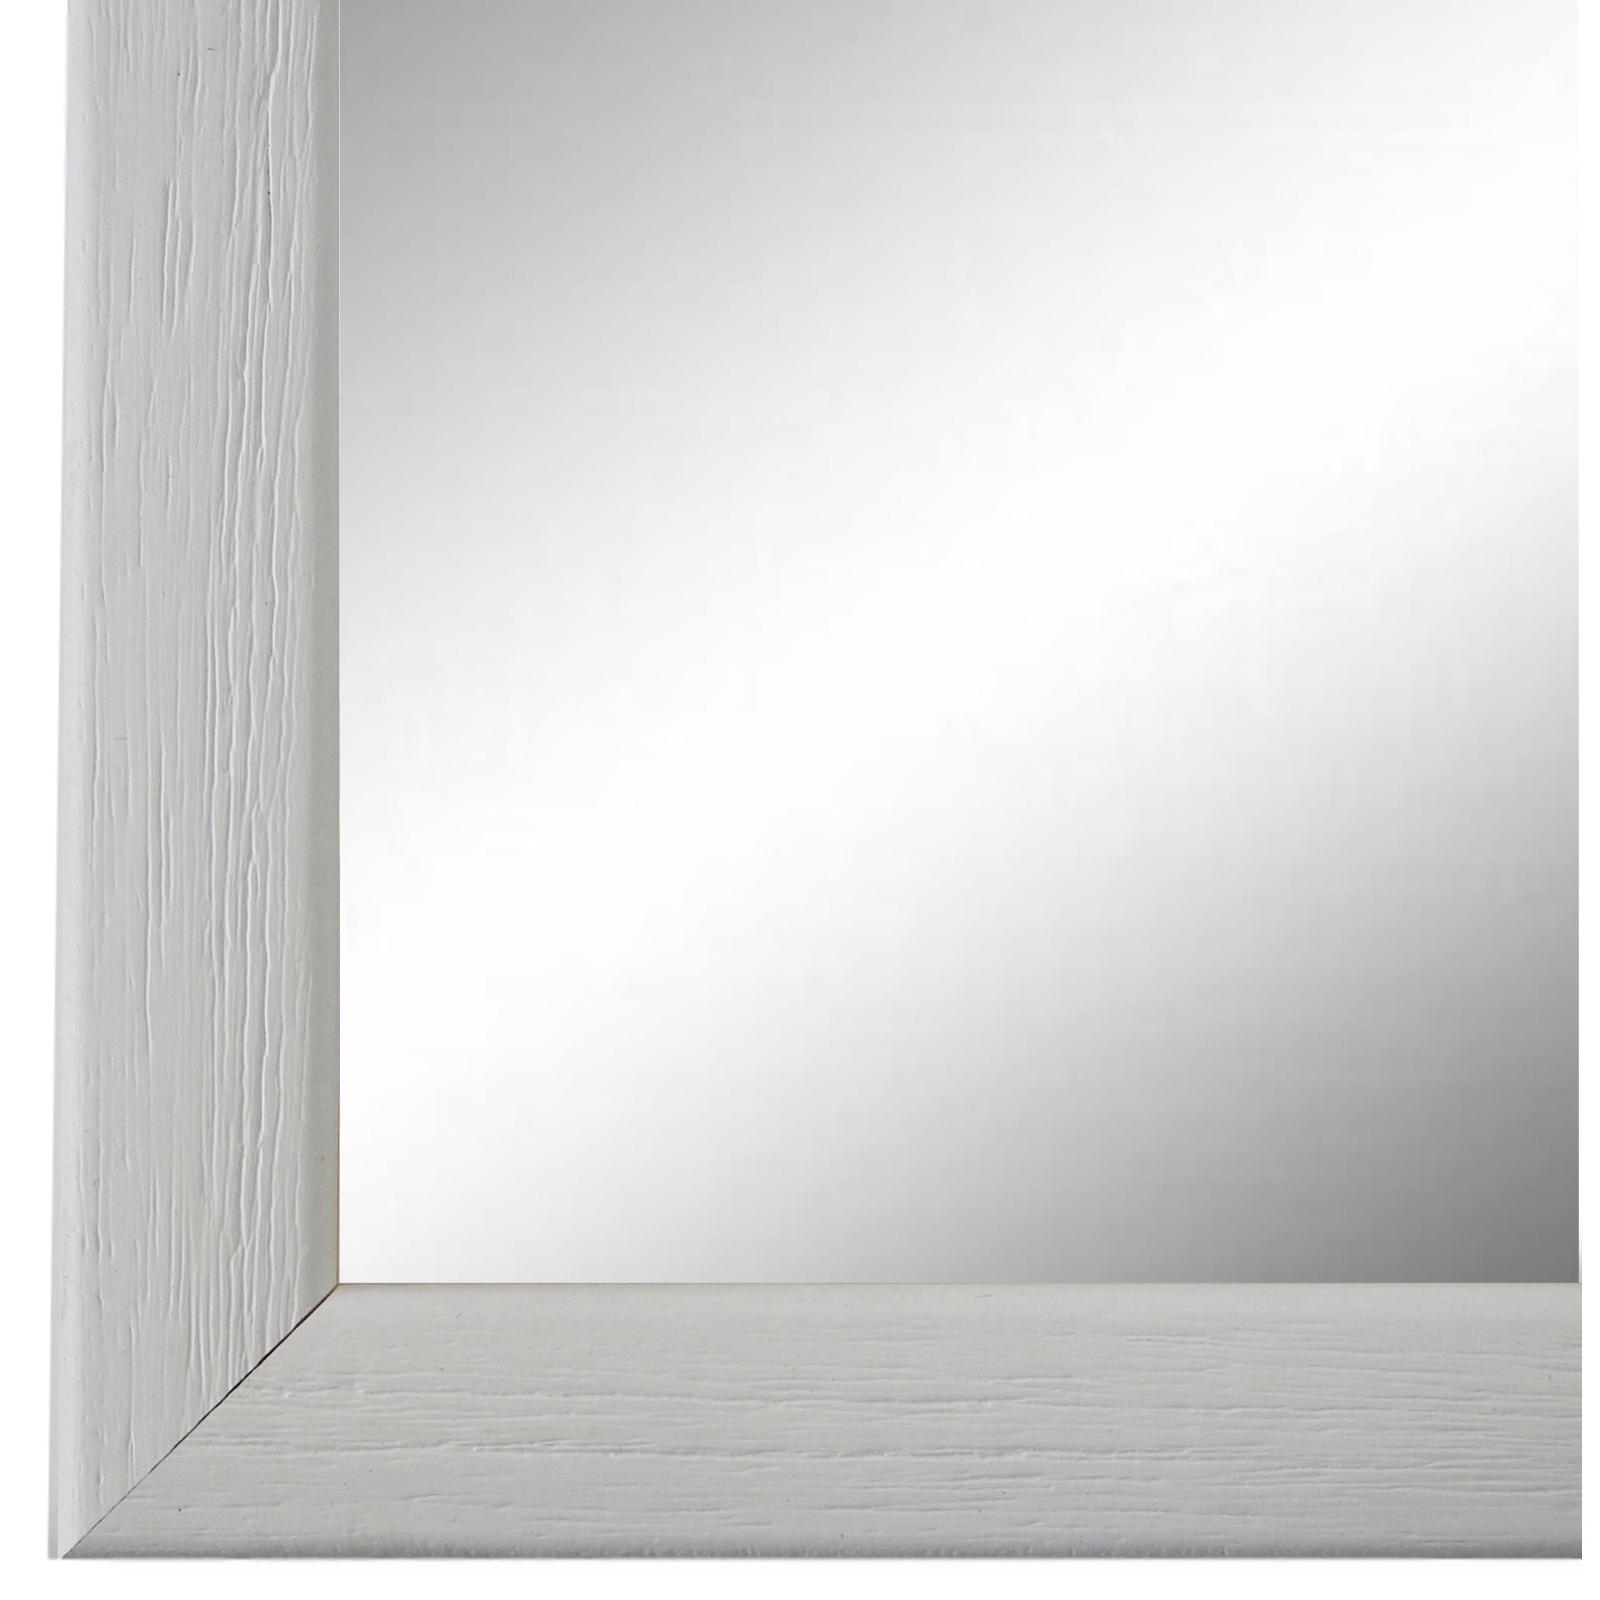 Spiegel Wandspiegel Flurspiegel Bad Weiss Modern Holz Pinerolo 2,3 - NEU